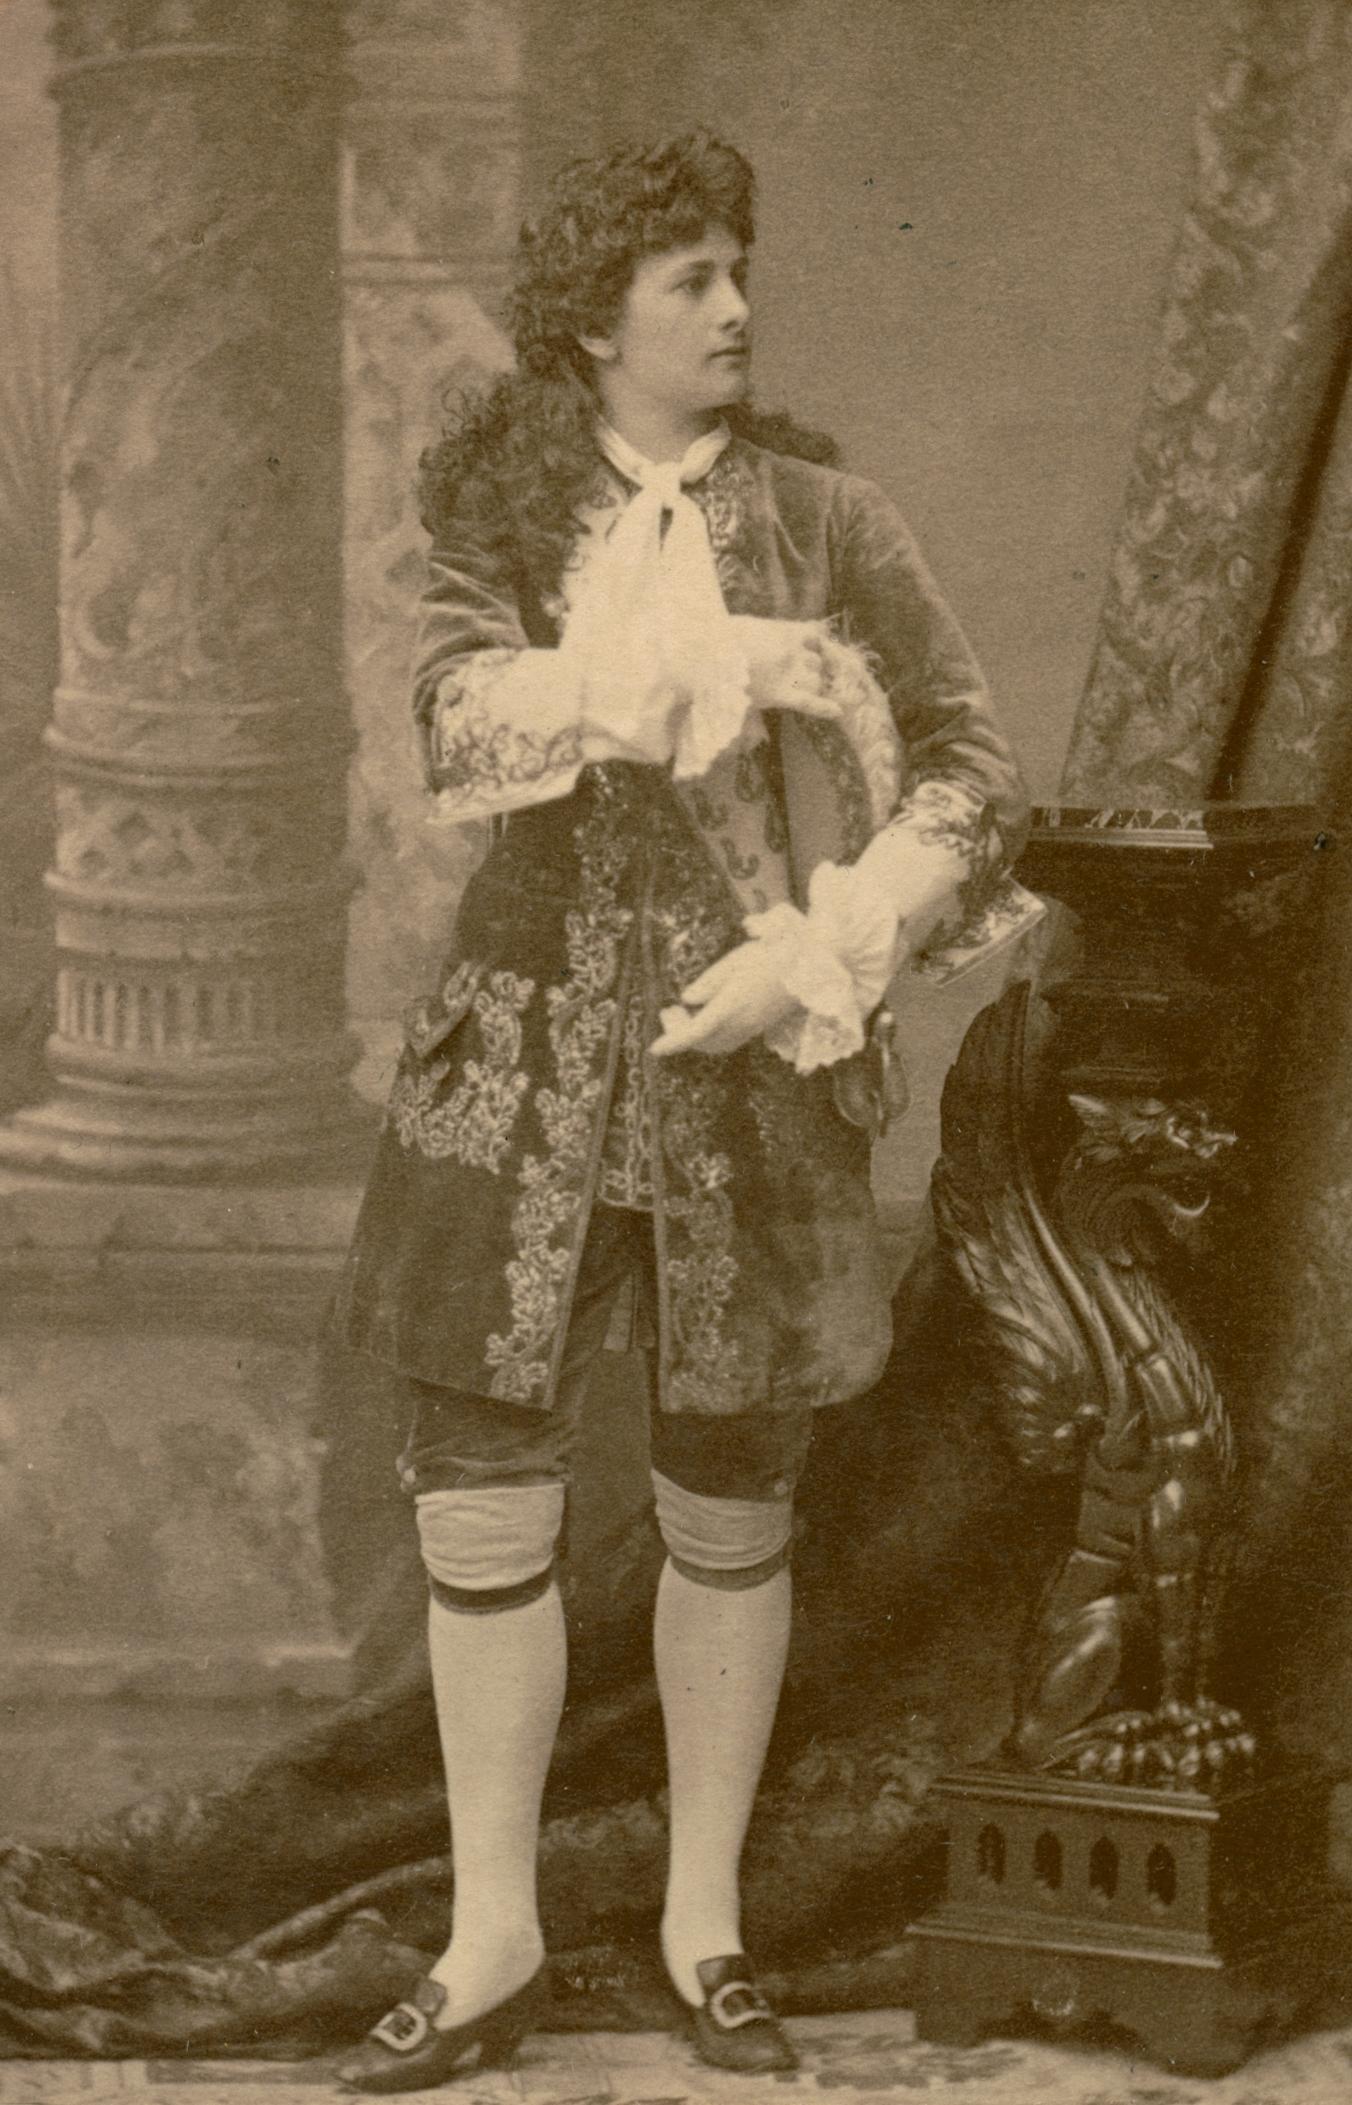 Helga Hoving as Richelieu in The Royal Dramatic Theatre's production of Les premières armes de Richelieu, 1885. Photo: Gösta Florman (1831-1900). Musik- och teaterbiblioteket, Stockholm (H4_108)